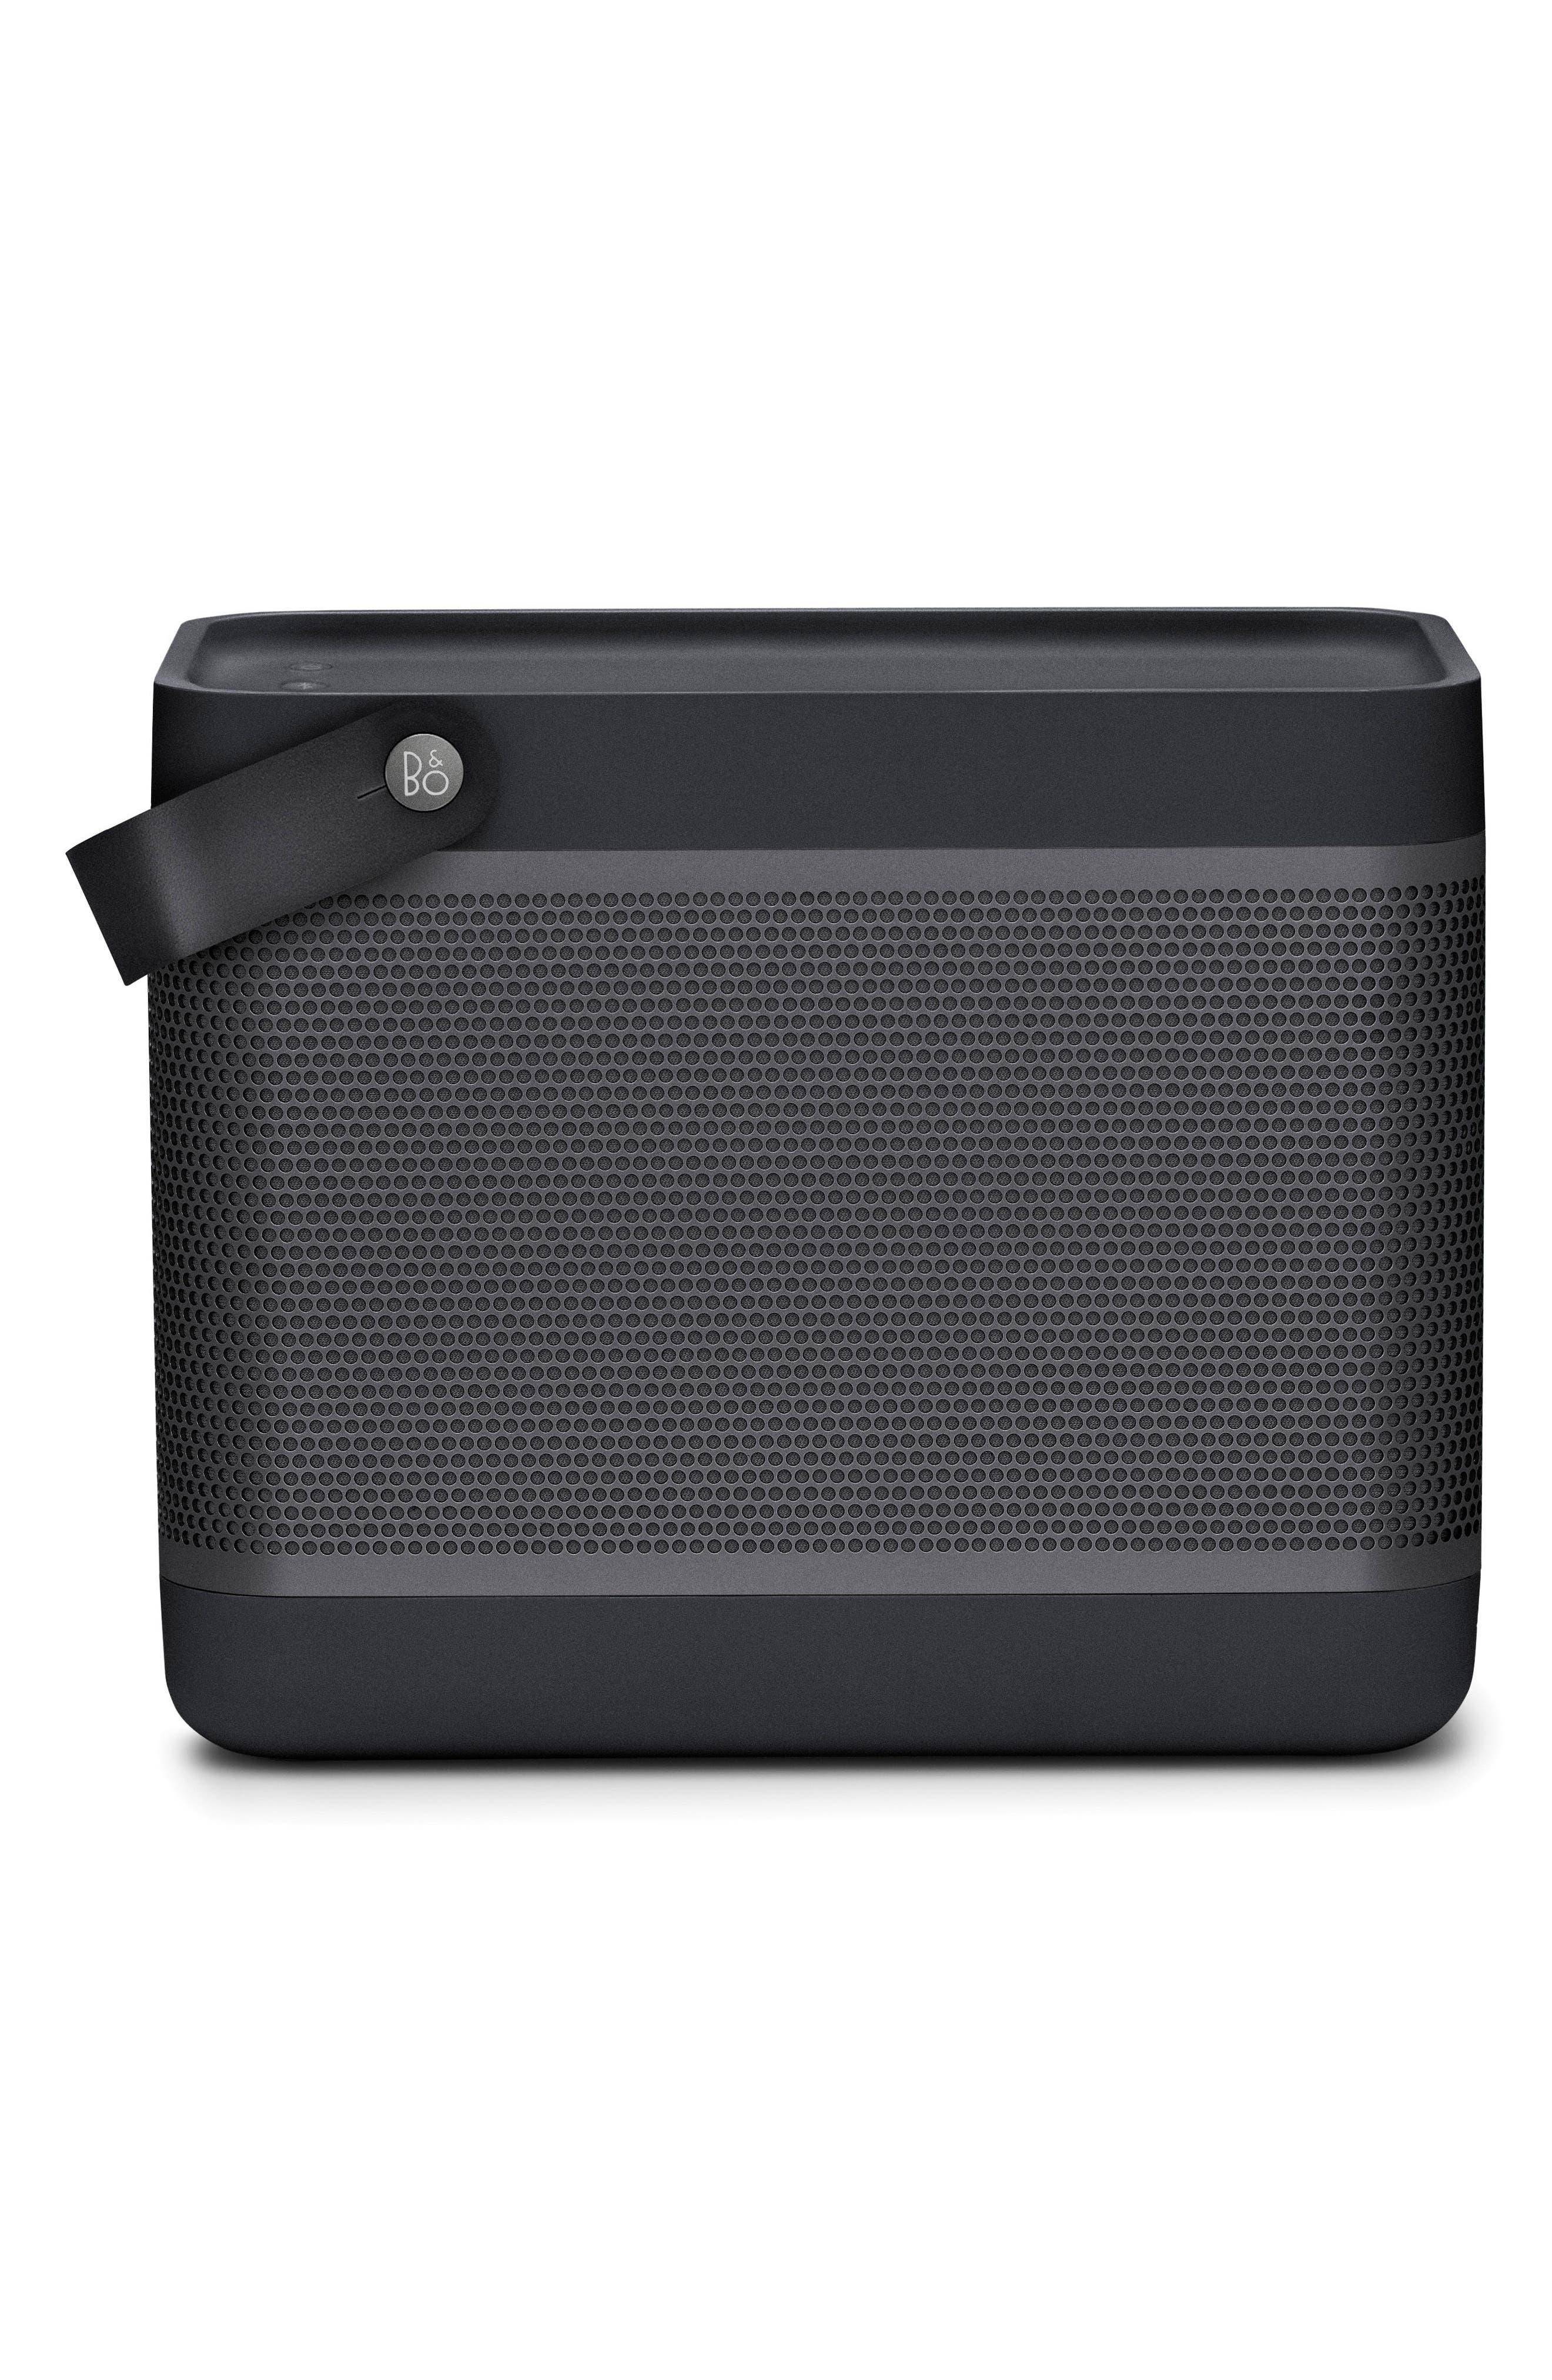 Main Image - B&O PLAY Beolit17 Portable Bluetooth® Speaker